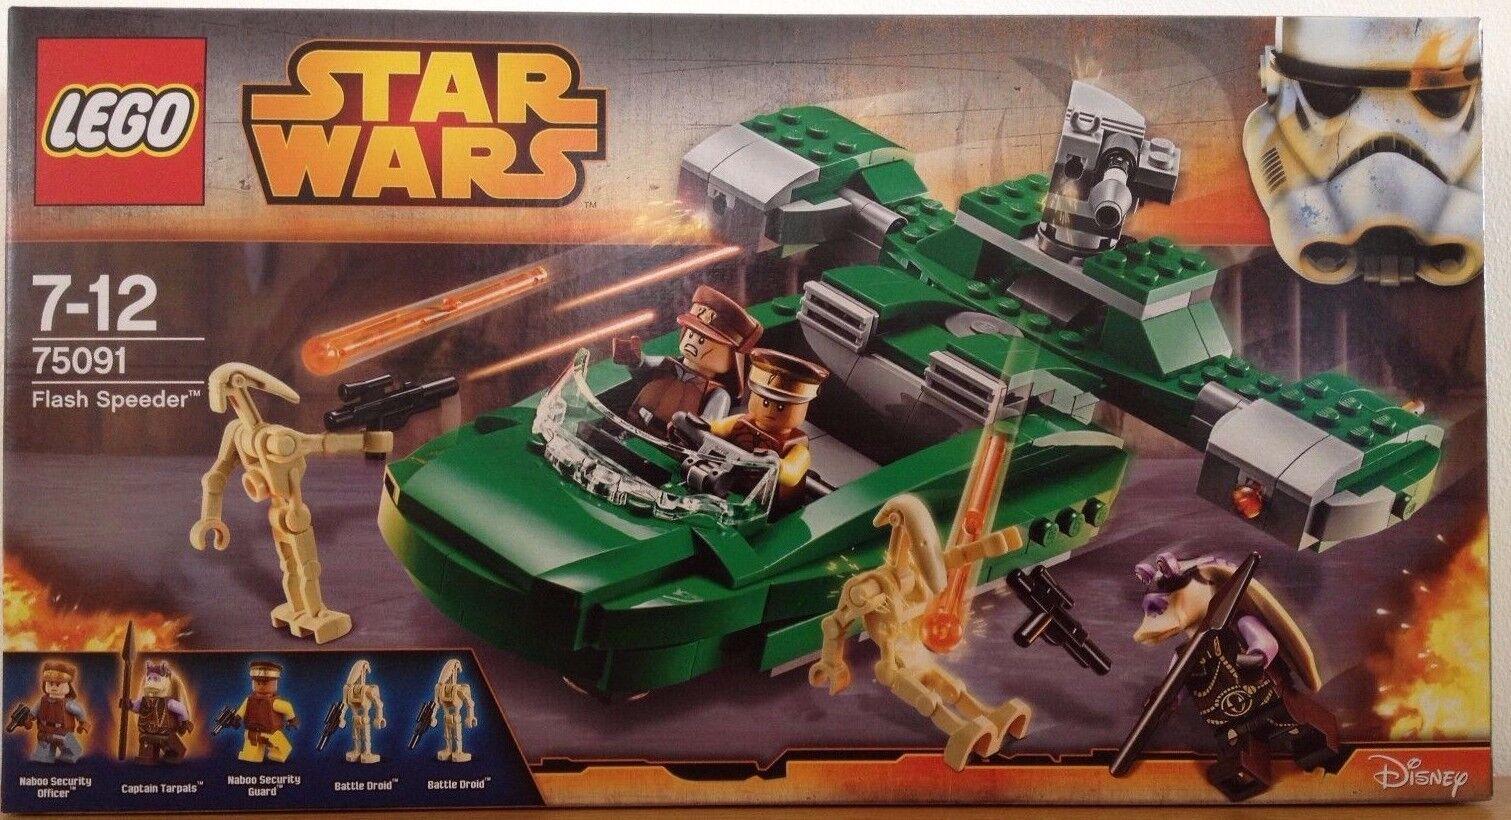 Lego Star Wars 75091 - Flash Speeder - Never Opened